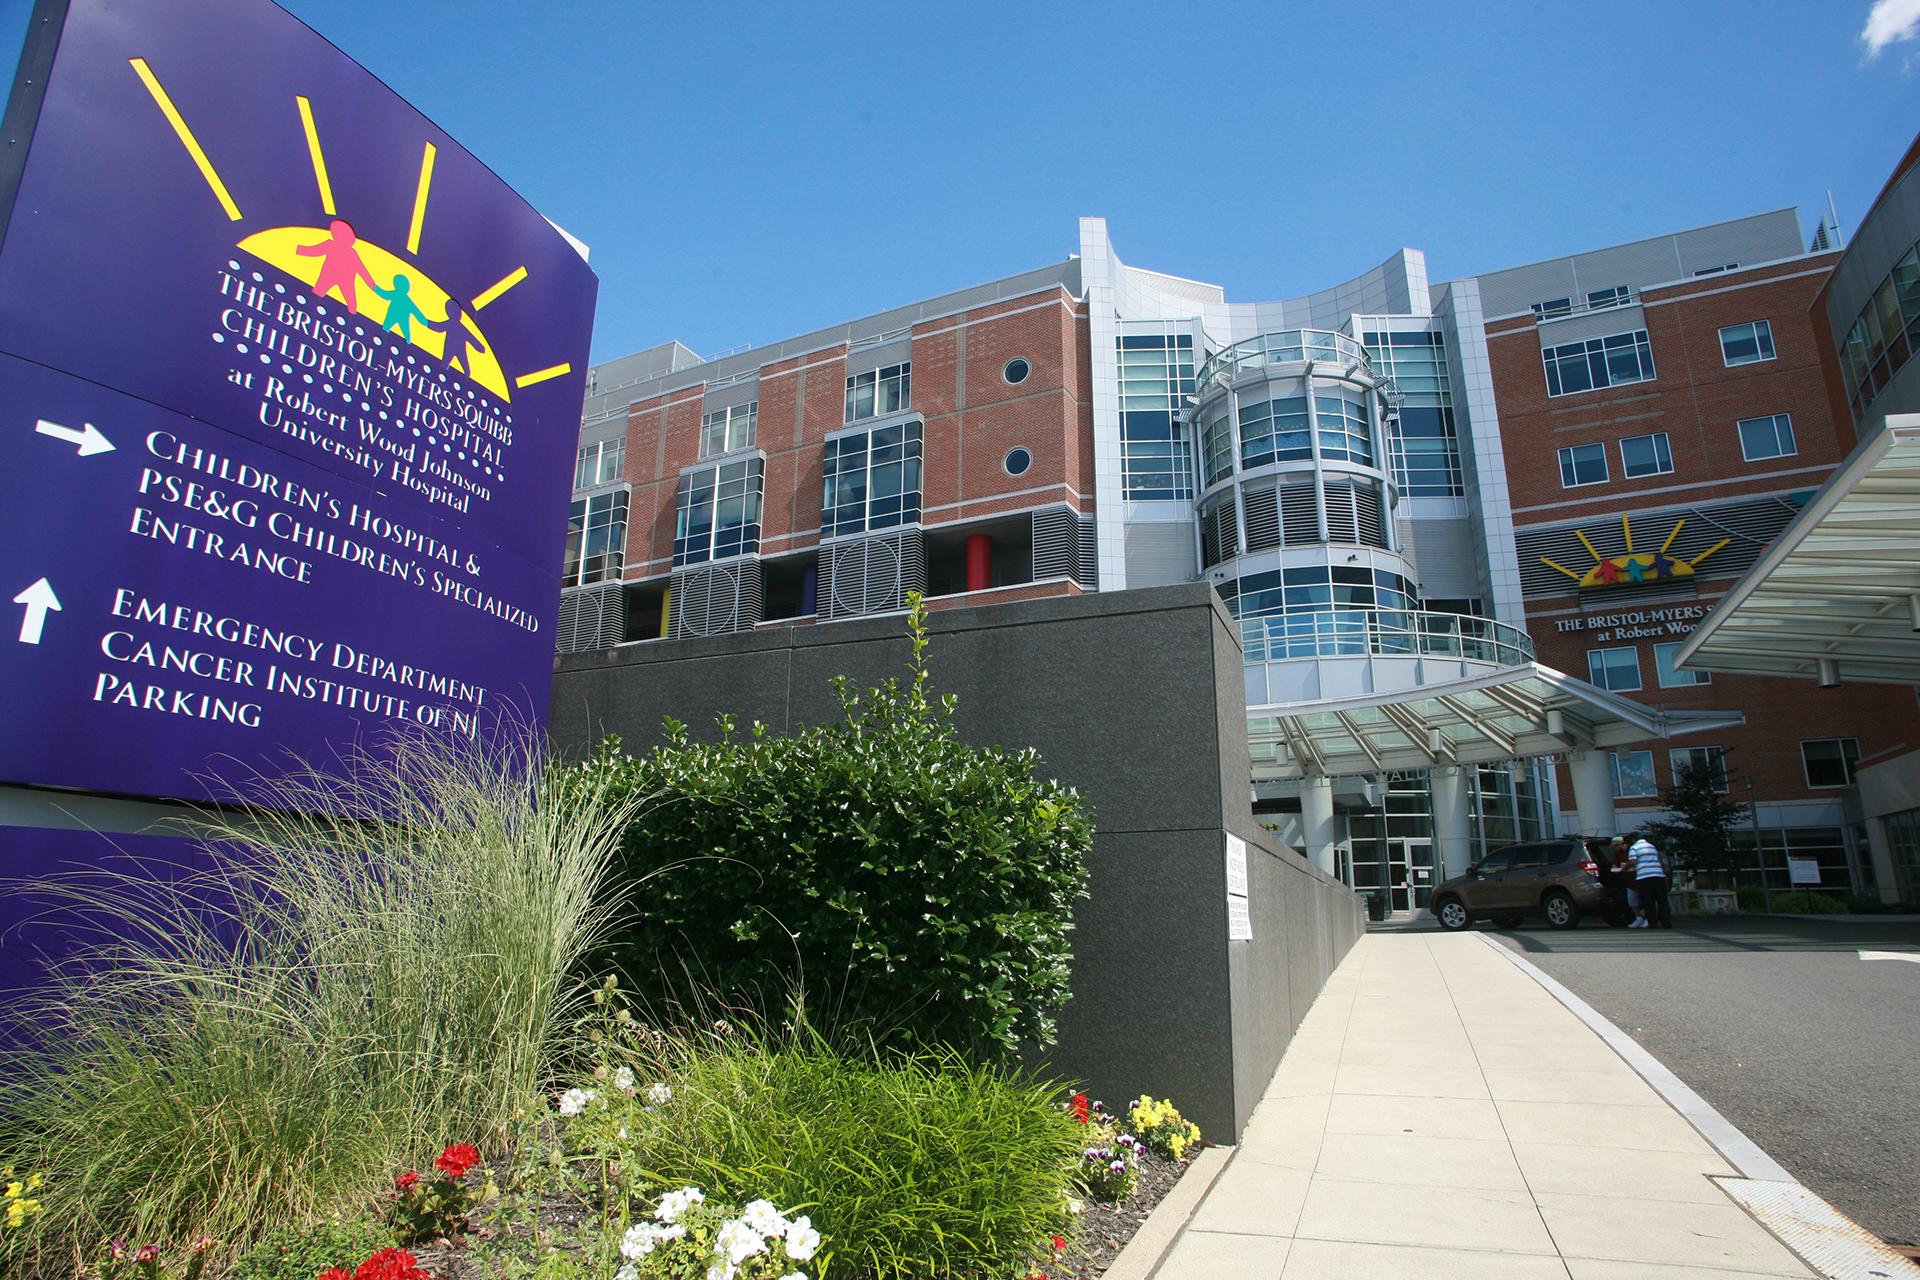 The Bristol-Myers Squibb Children's Hospital Project - Wm ...